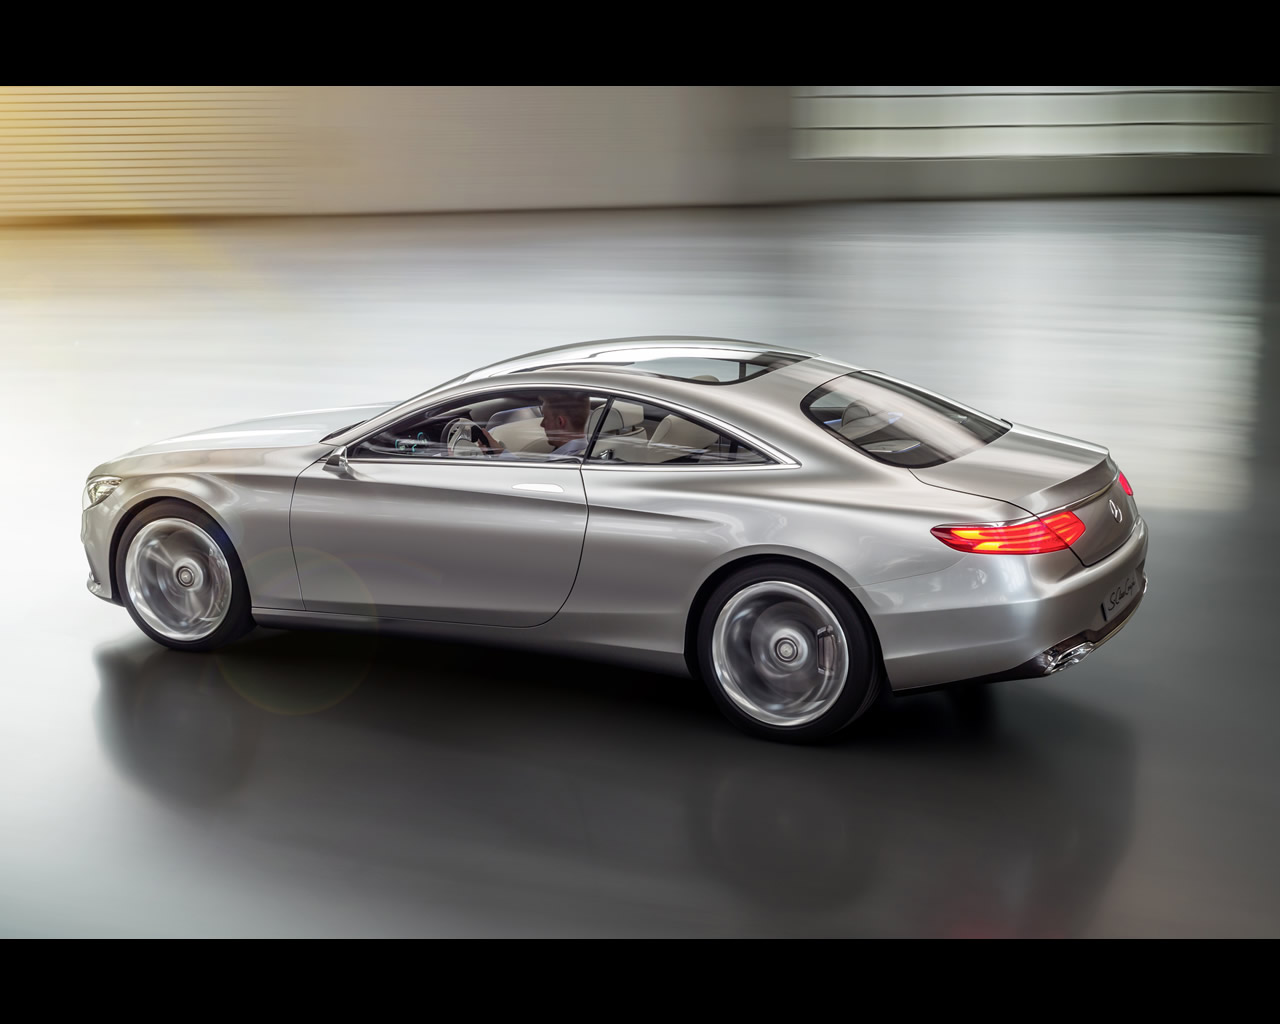 Mercedes benz concept s class coup 2013 for Mercedes benz coupe 2013